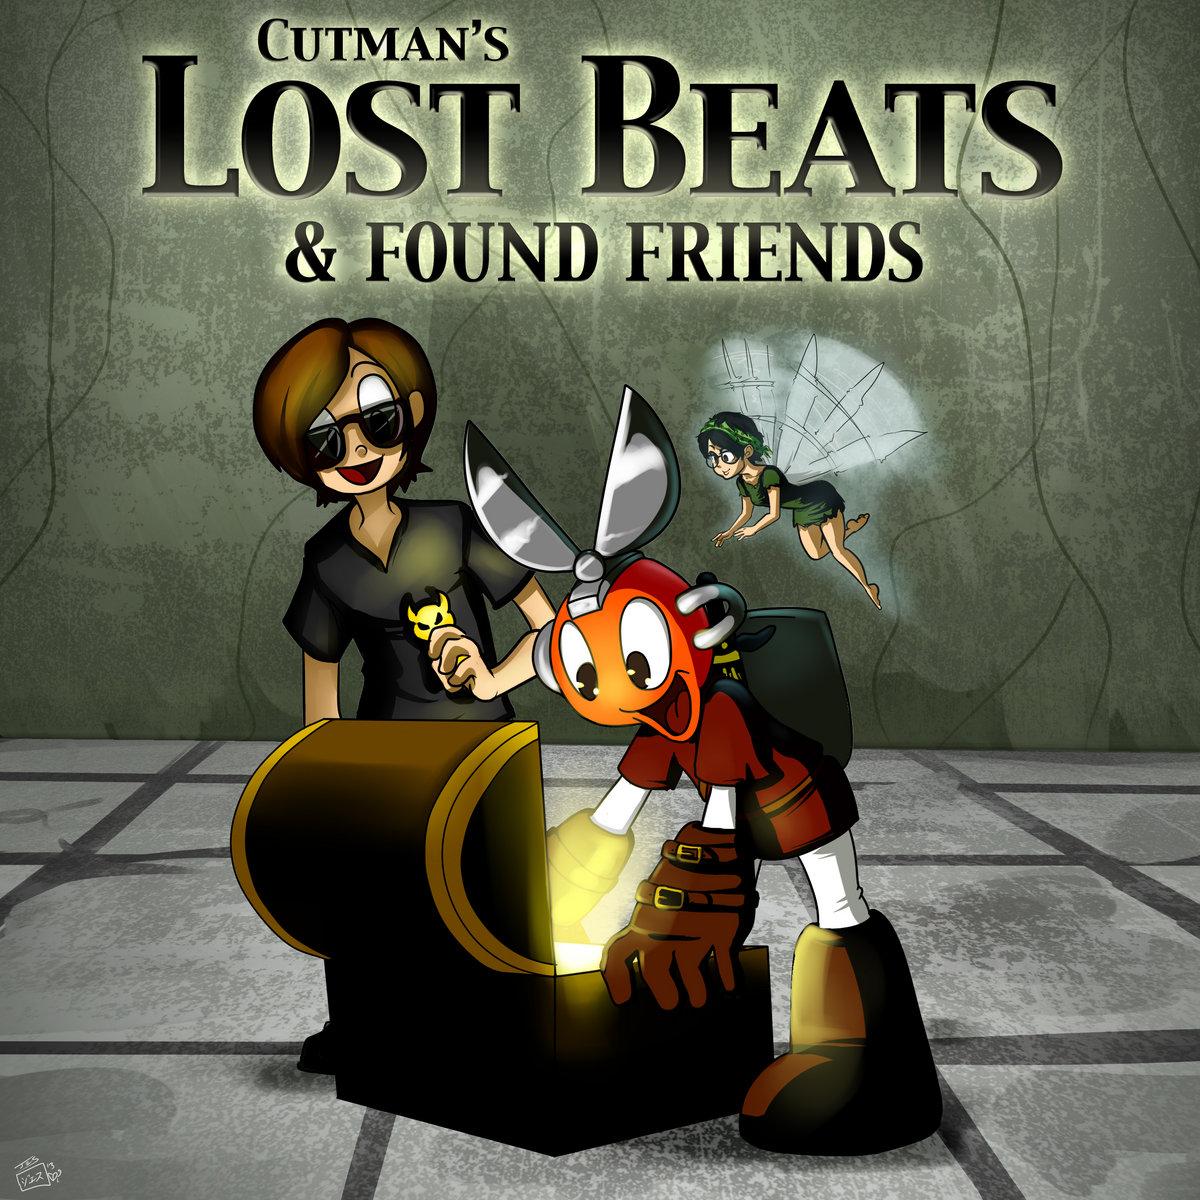 Ben Landis Through The Forest Cutman X Villecco Remix Dj Cutman